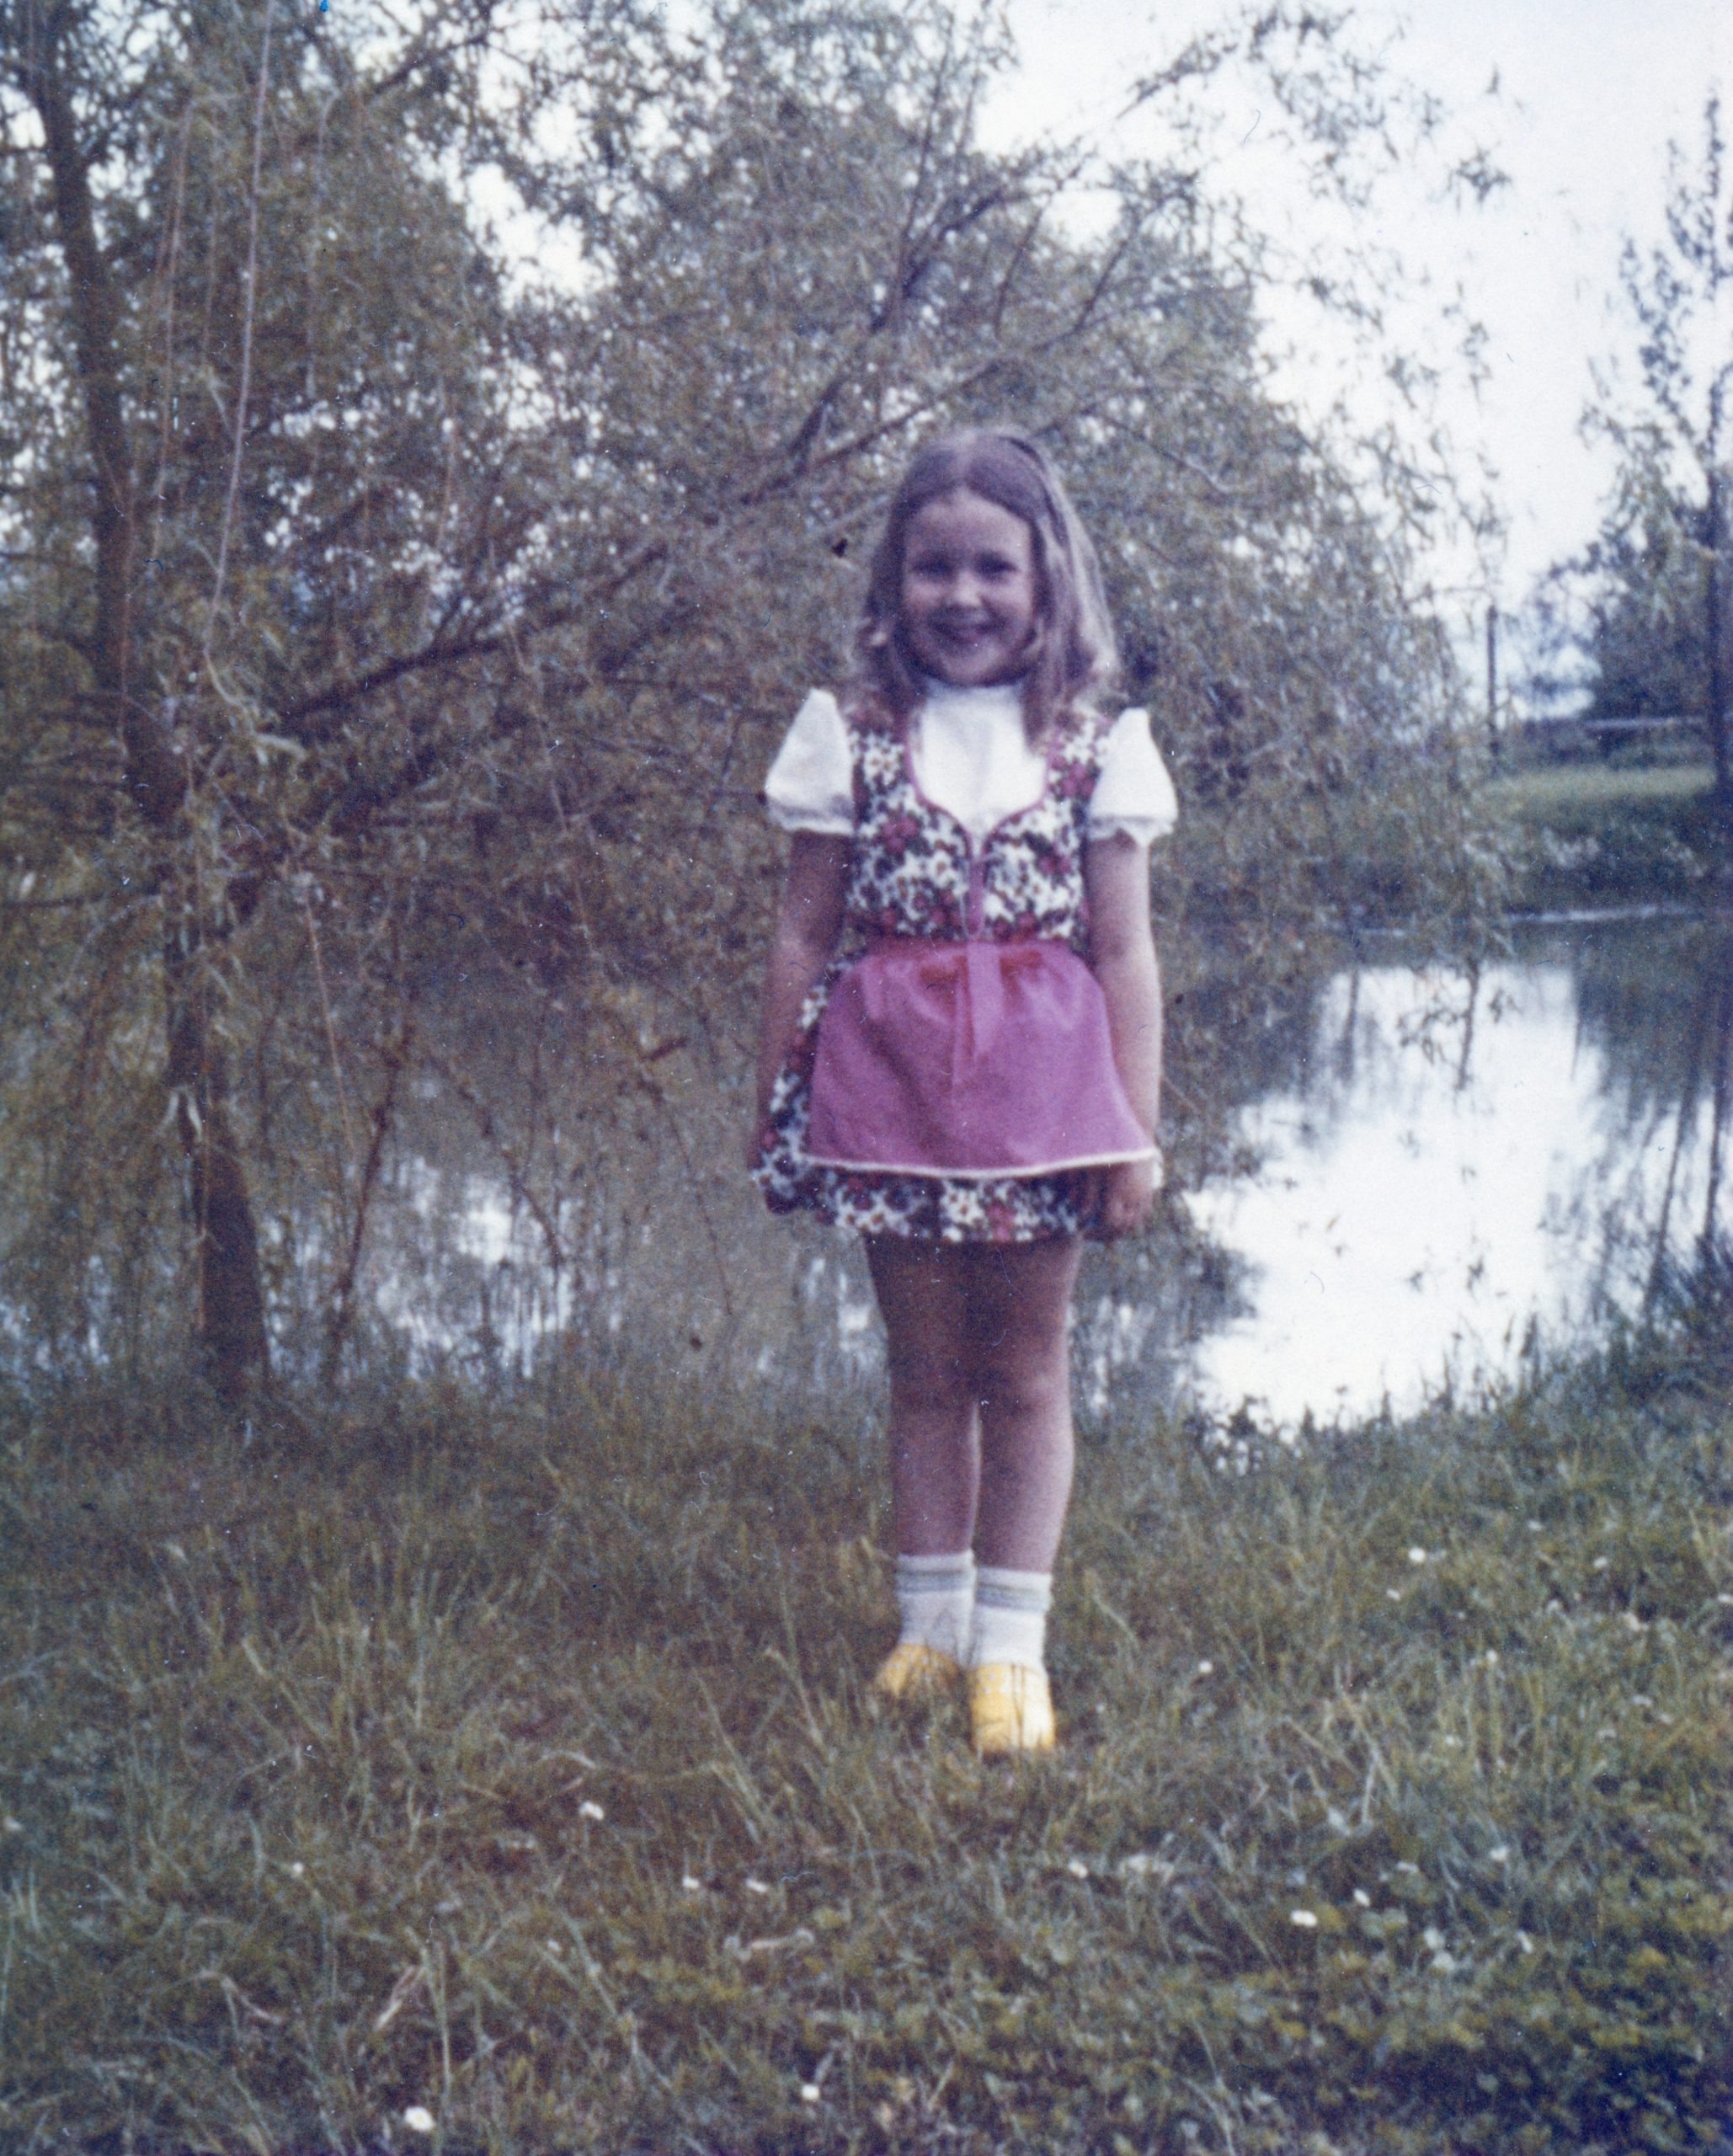 Budenberg-Rätsel mit Kinderfotos (18)